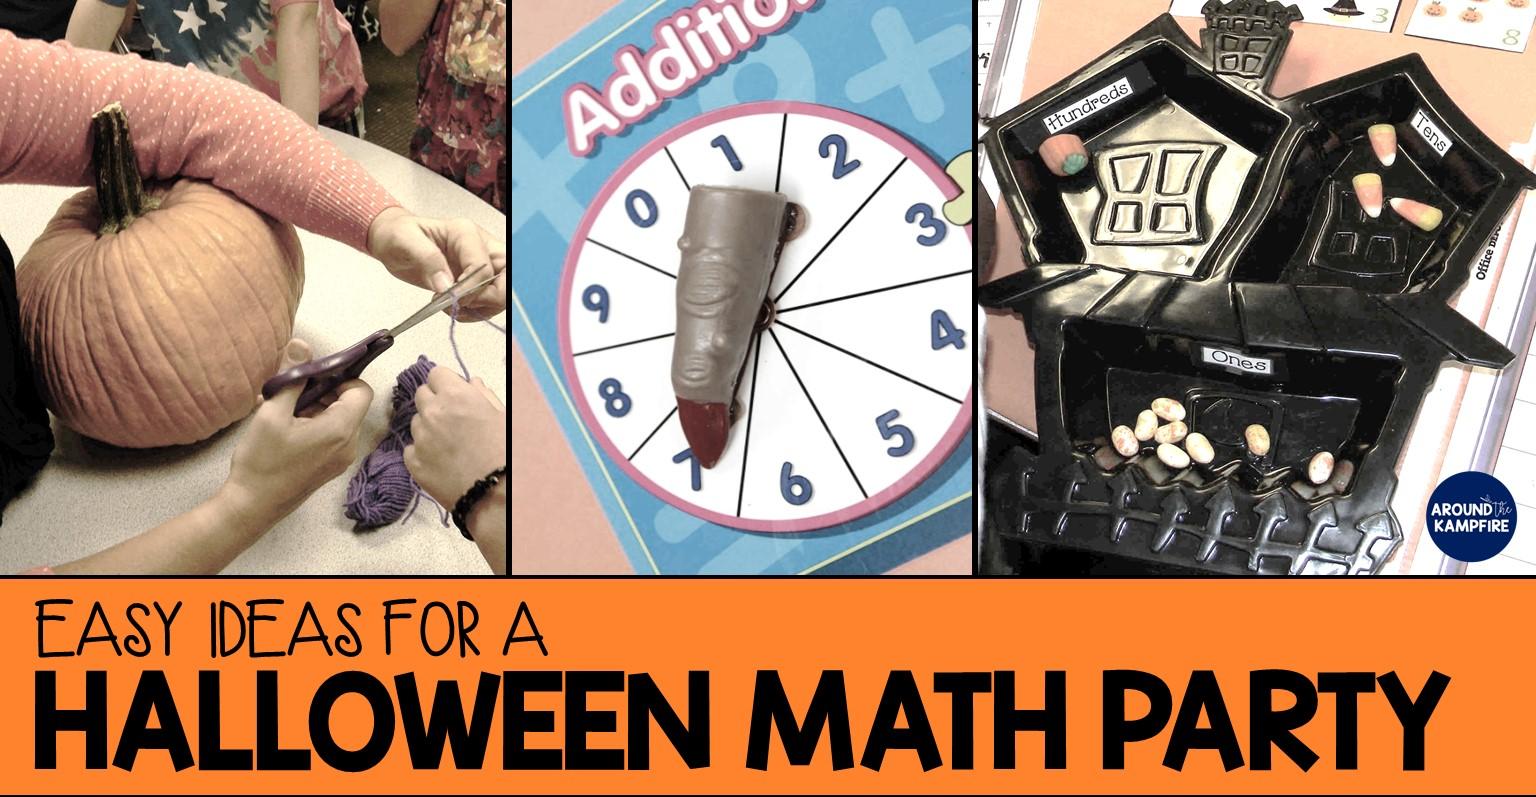 Easy ideas Halloween math party AroundtheKampfire 1a